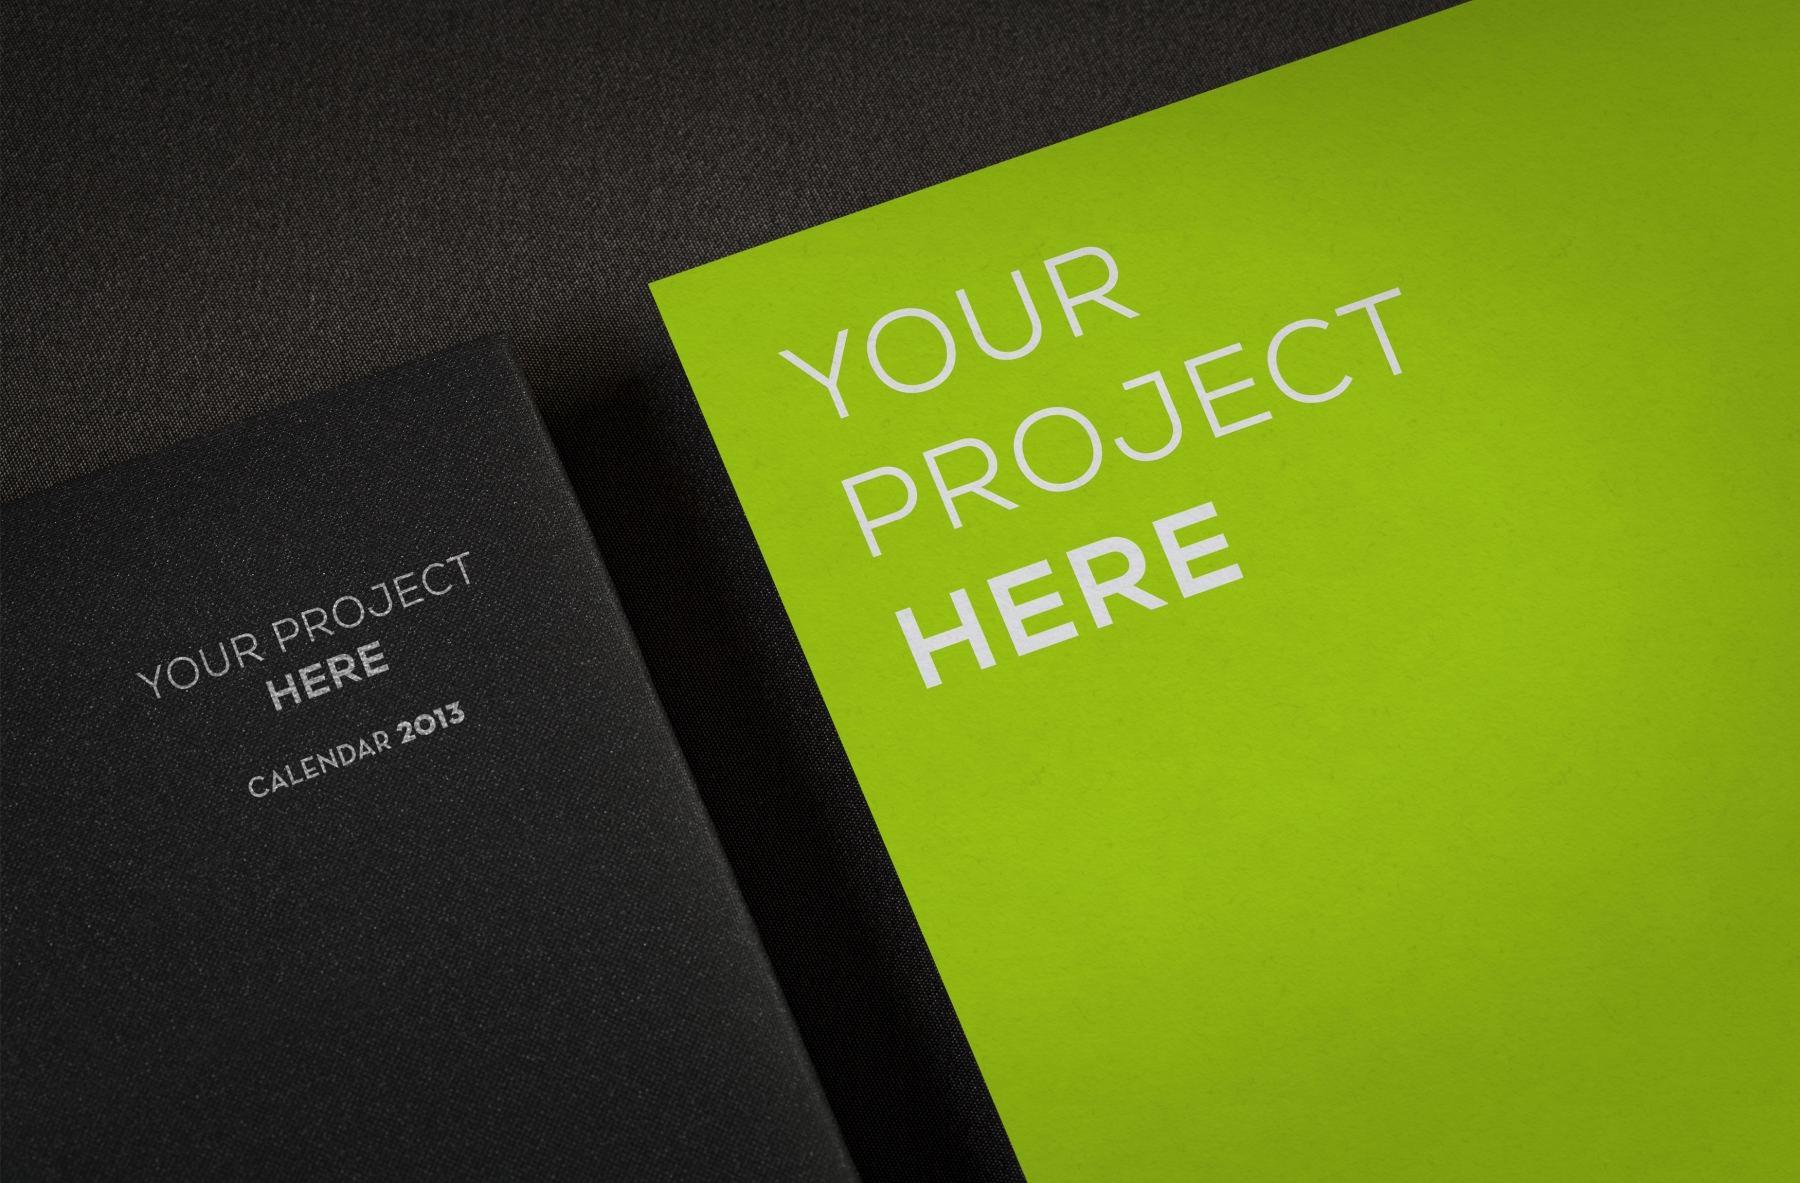 1568981426 7f5c6dc11c2c091 - 绿色系卡片企业vi样机